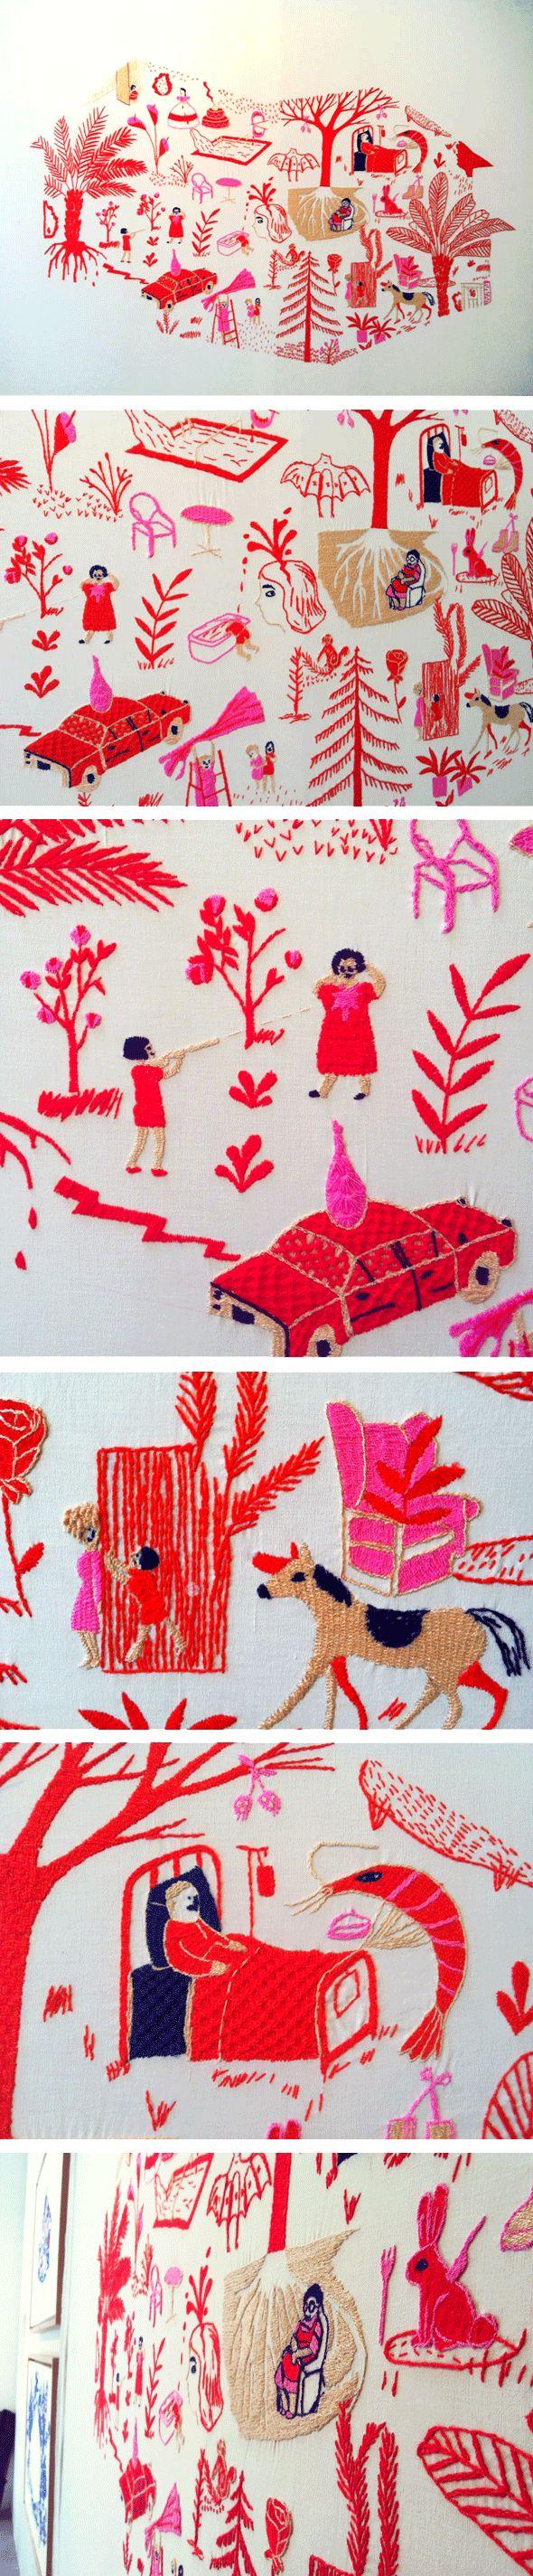 hasta mostla embroidery